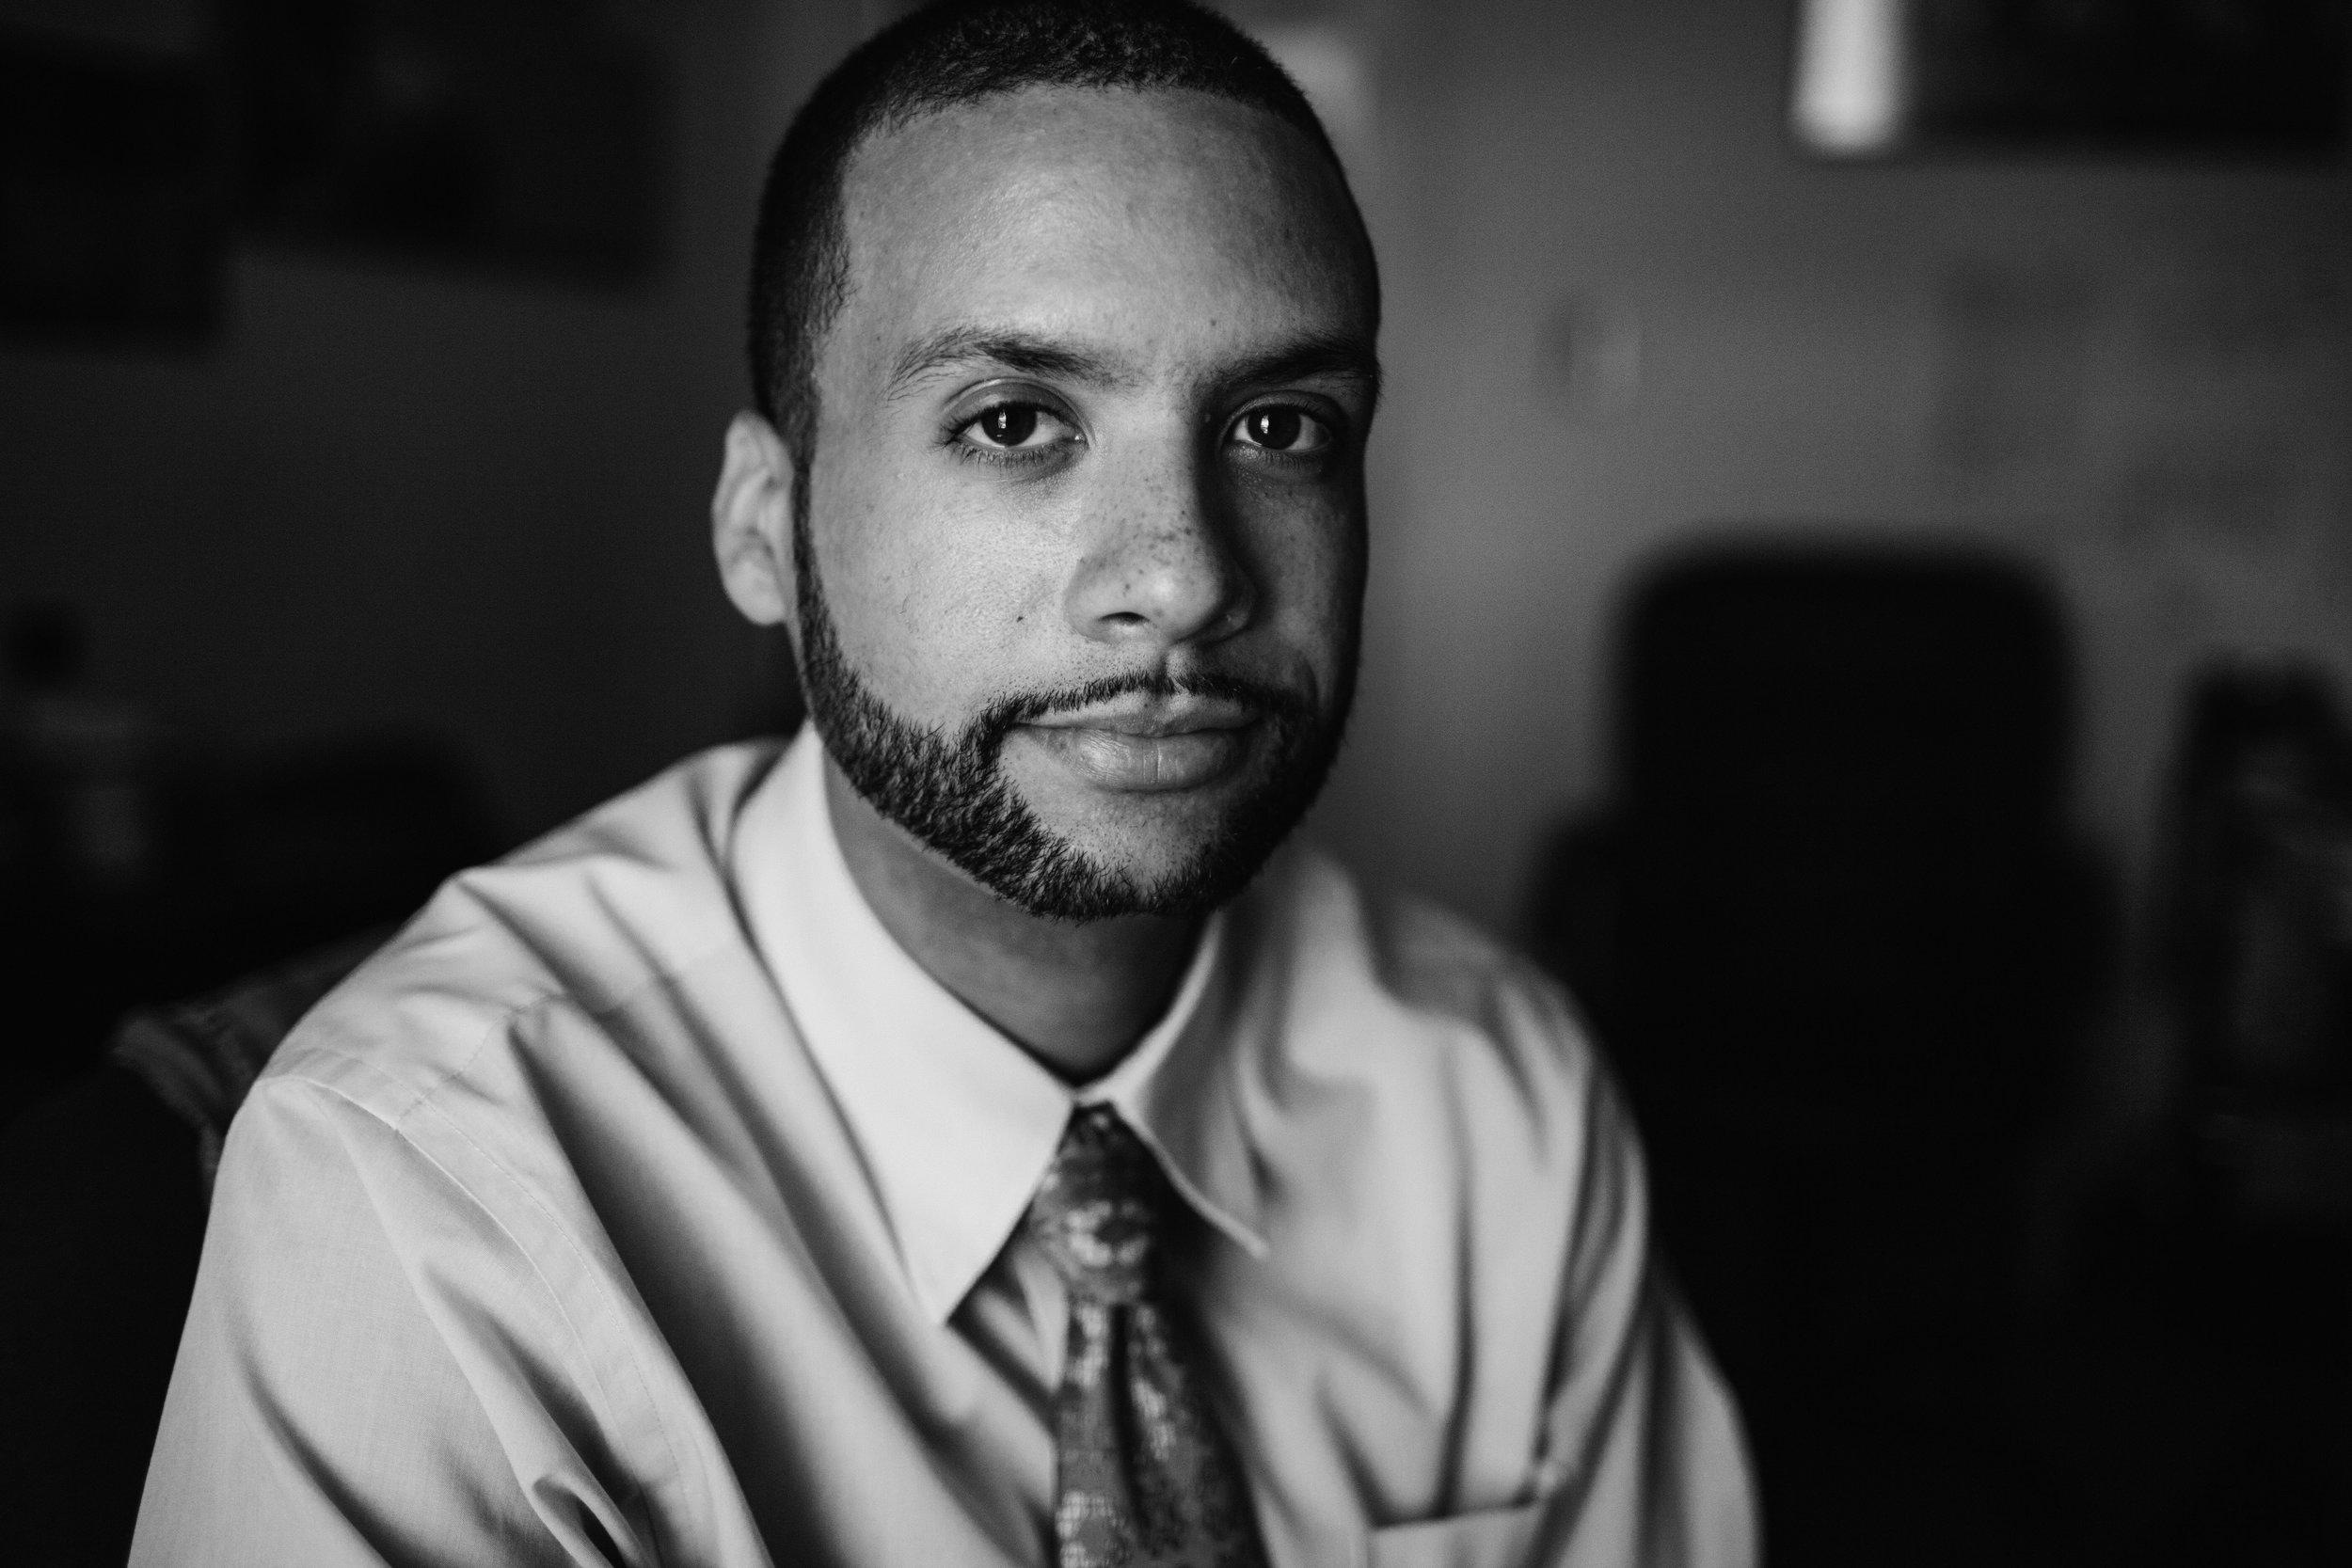 William Snowden - Senior Public Defender for the Orleans Public Defenders Office